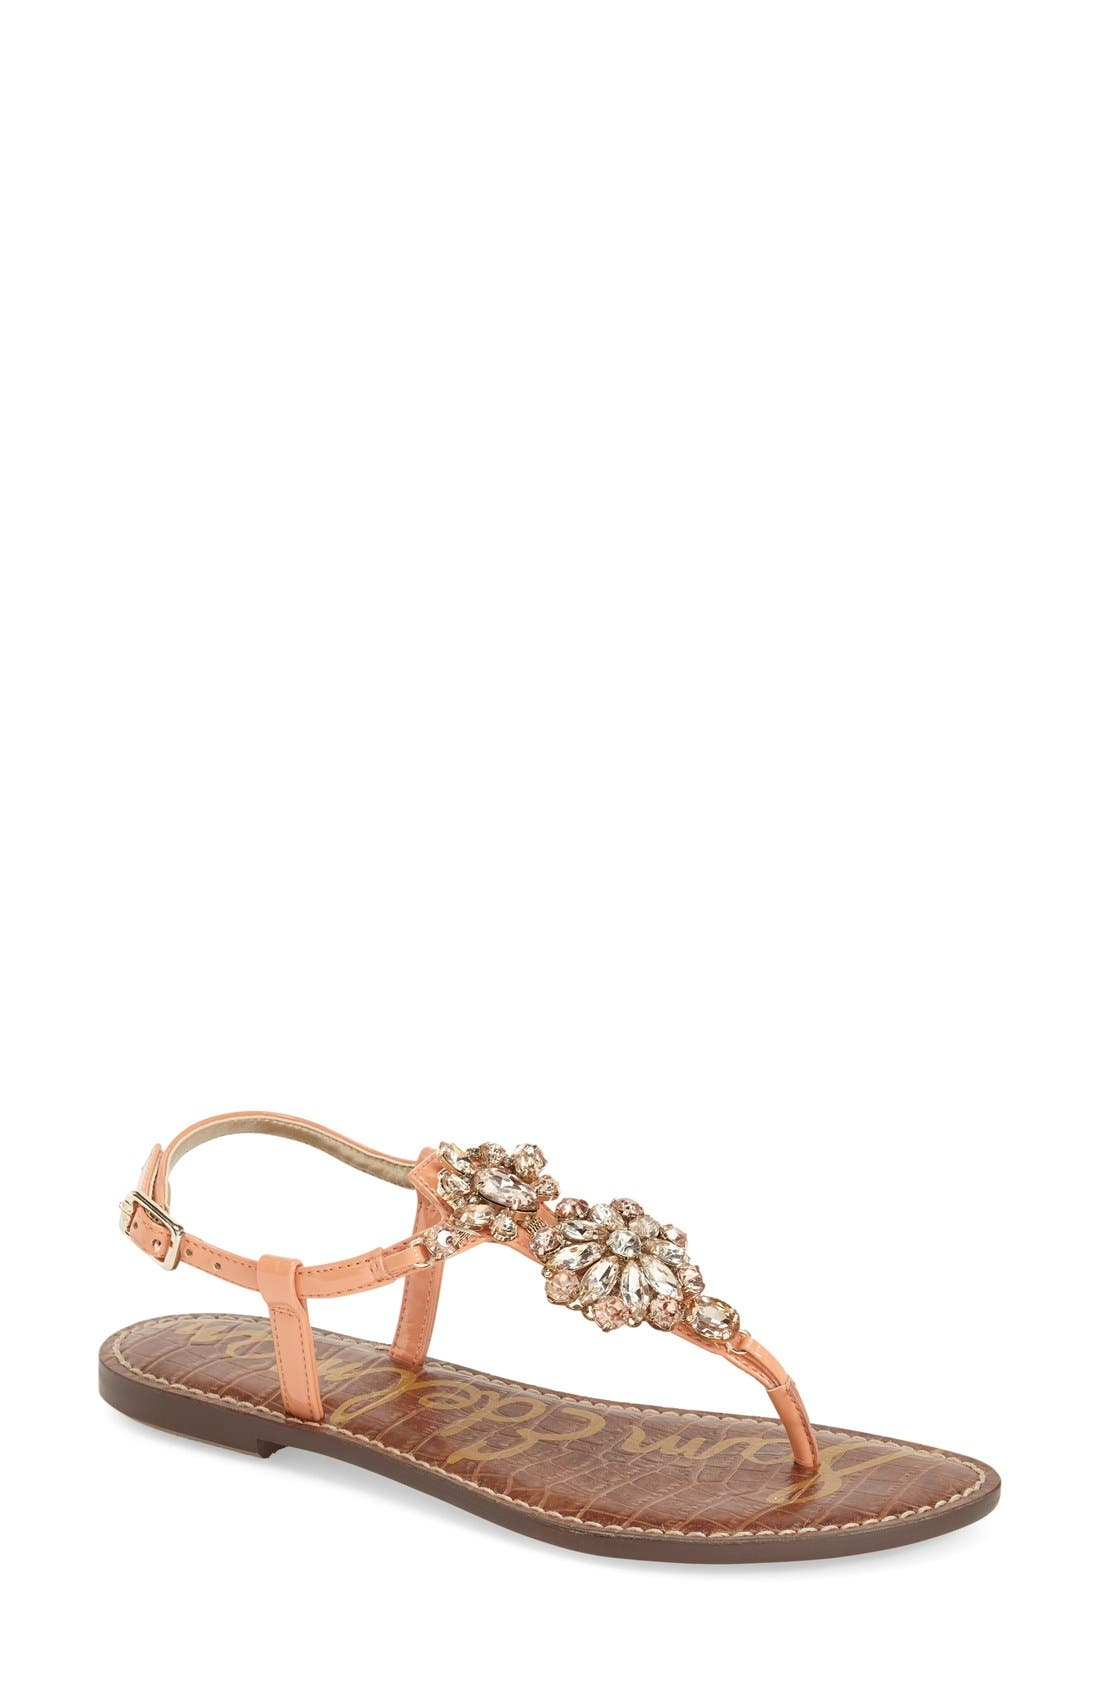 Alternate Image 1 Selected - Sam Edelman 'Grayson' Crystal Flower Flat Sandal (Women)